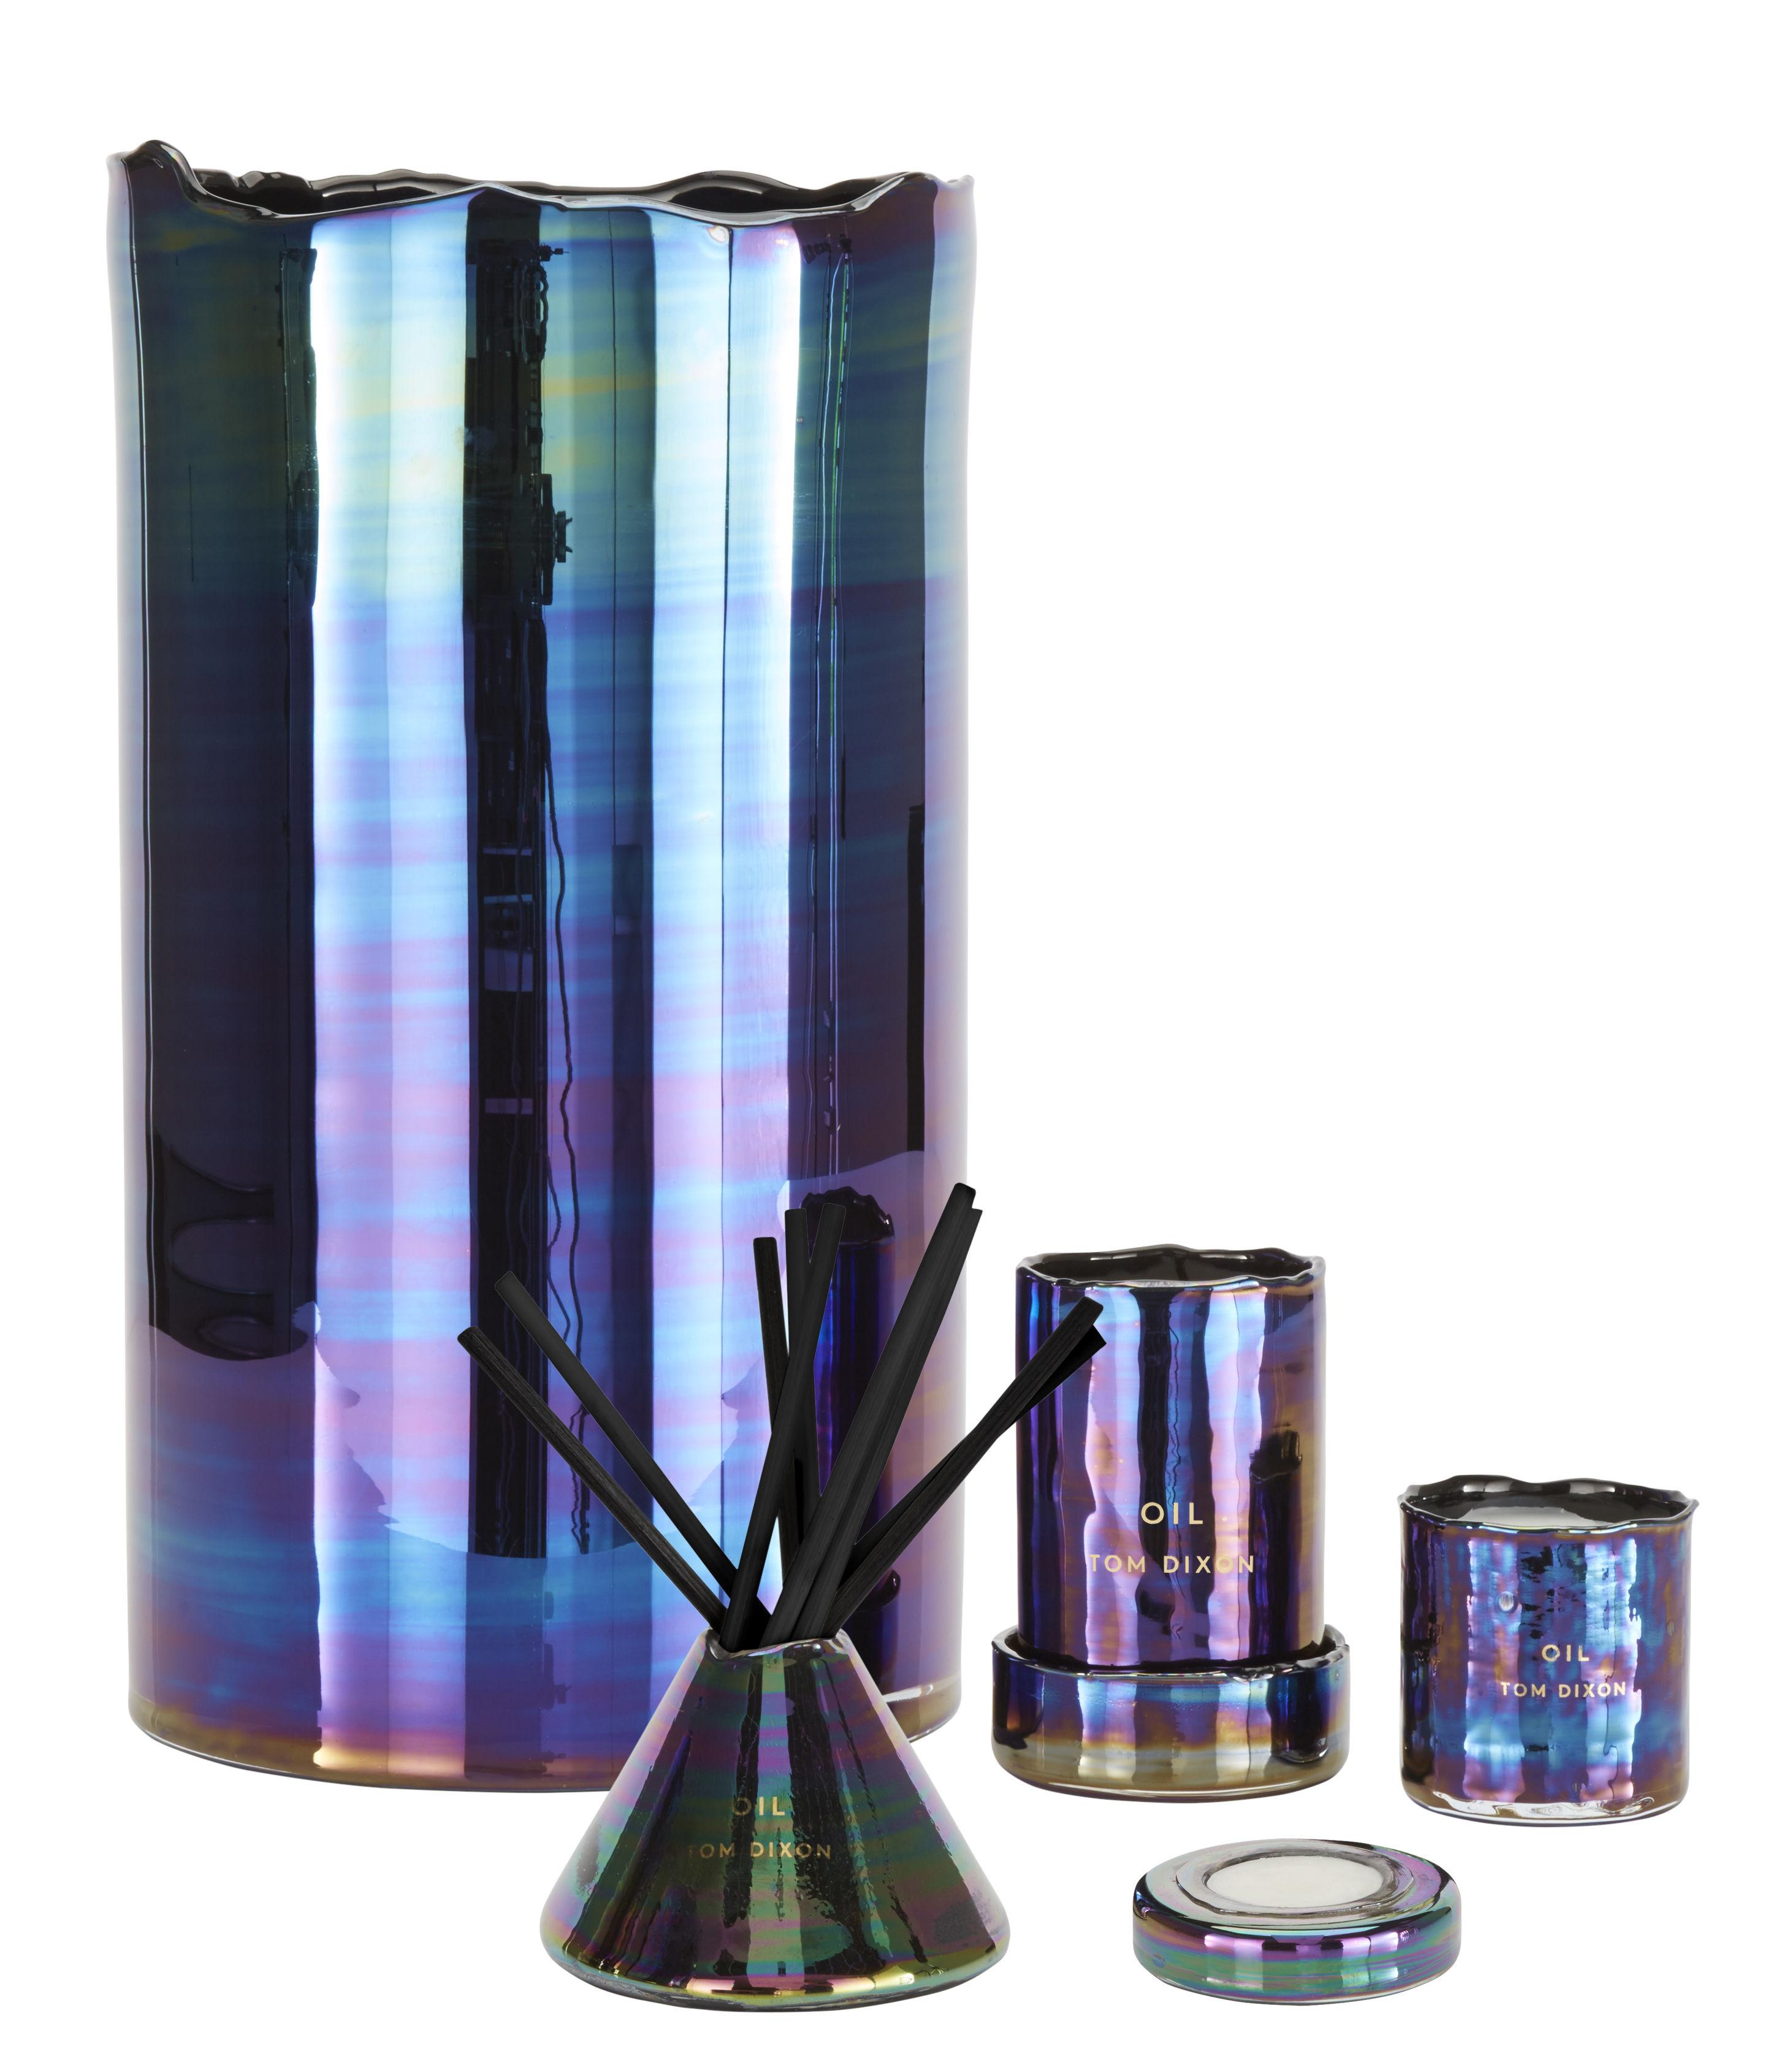 diffuseur de parfum oil avec b tonnets bleu iridescent. Black Bedroom Furniture Sets. Home Design Ideas